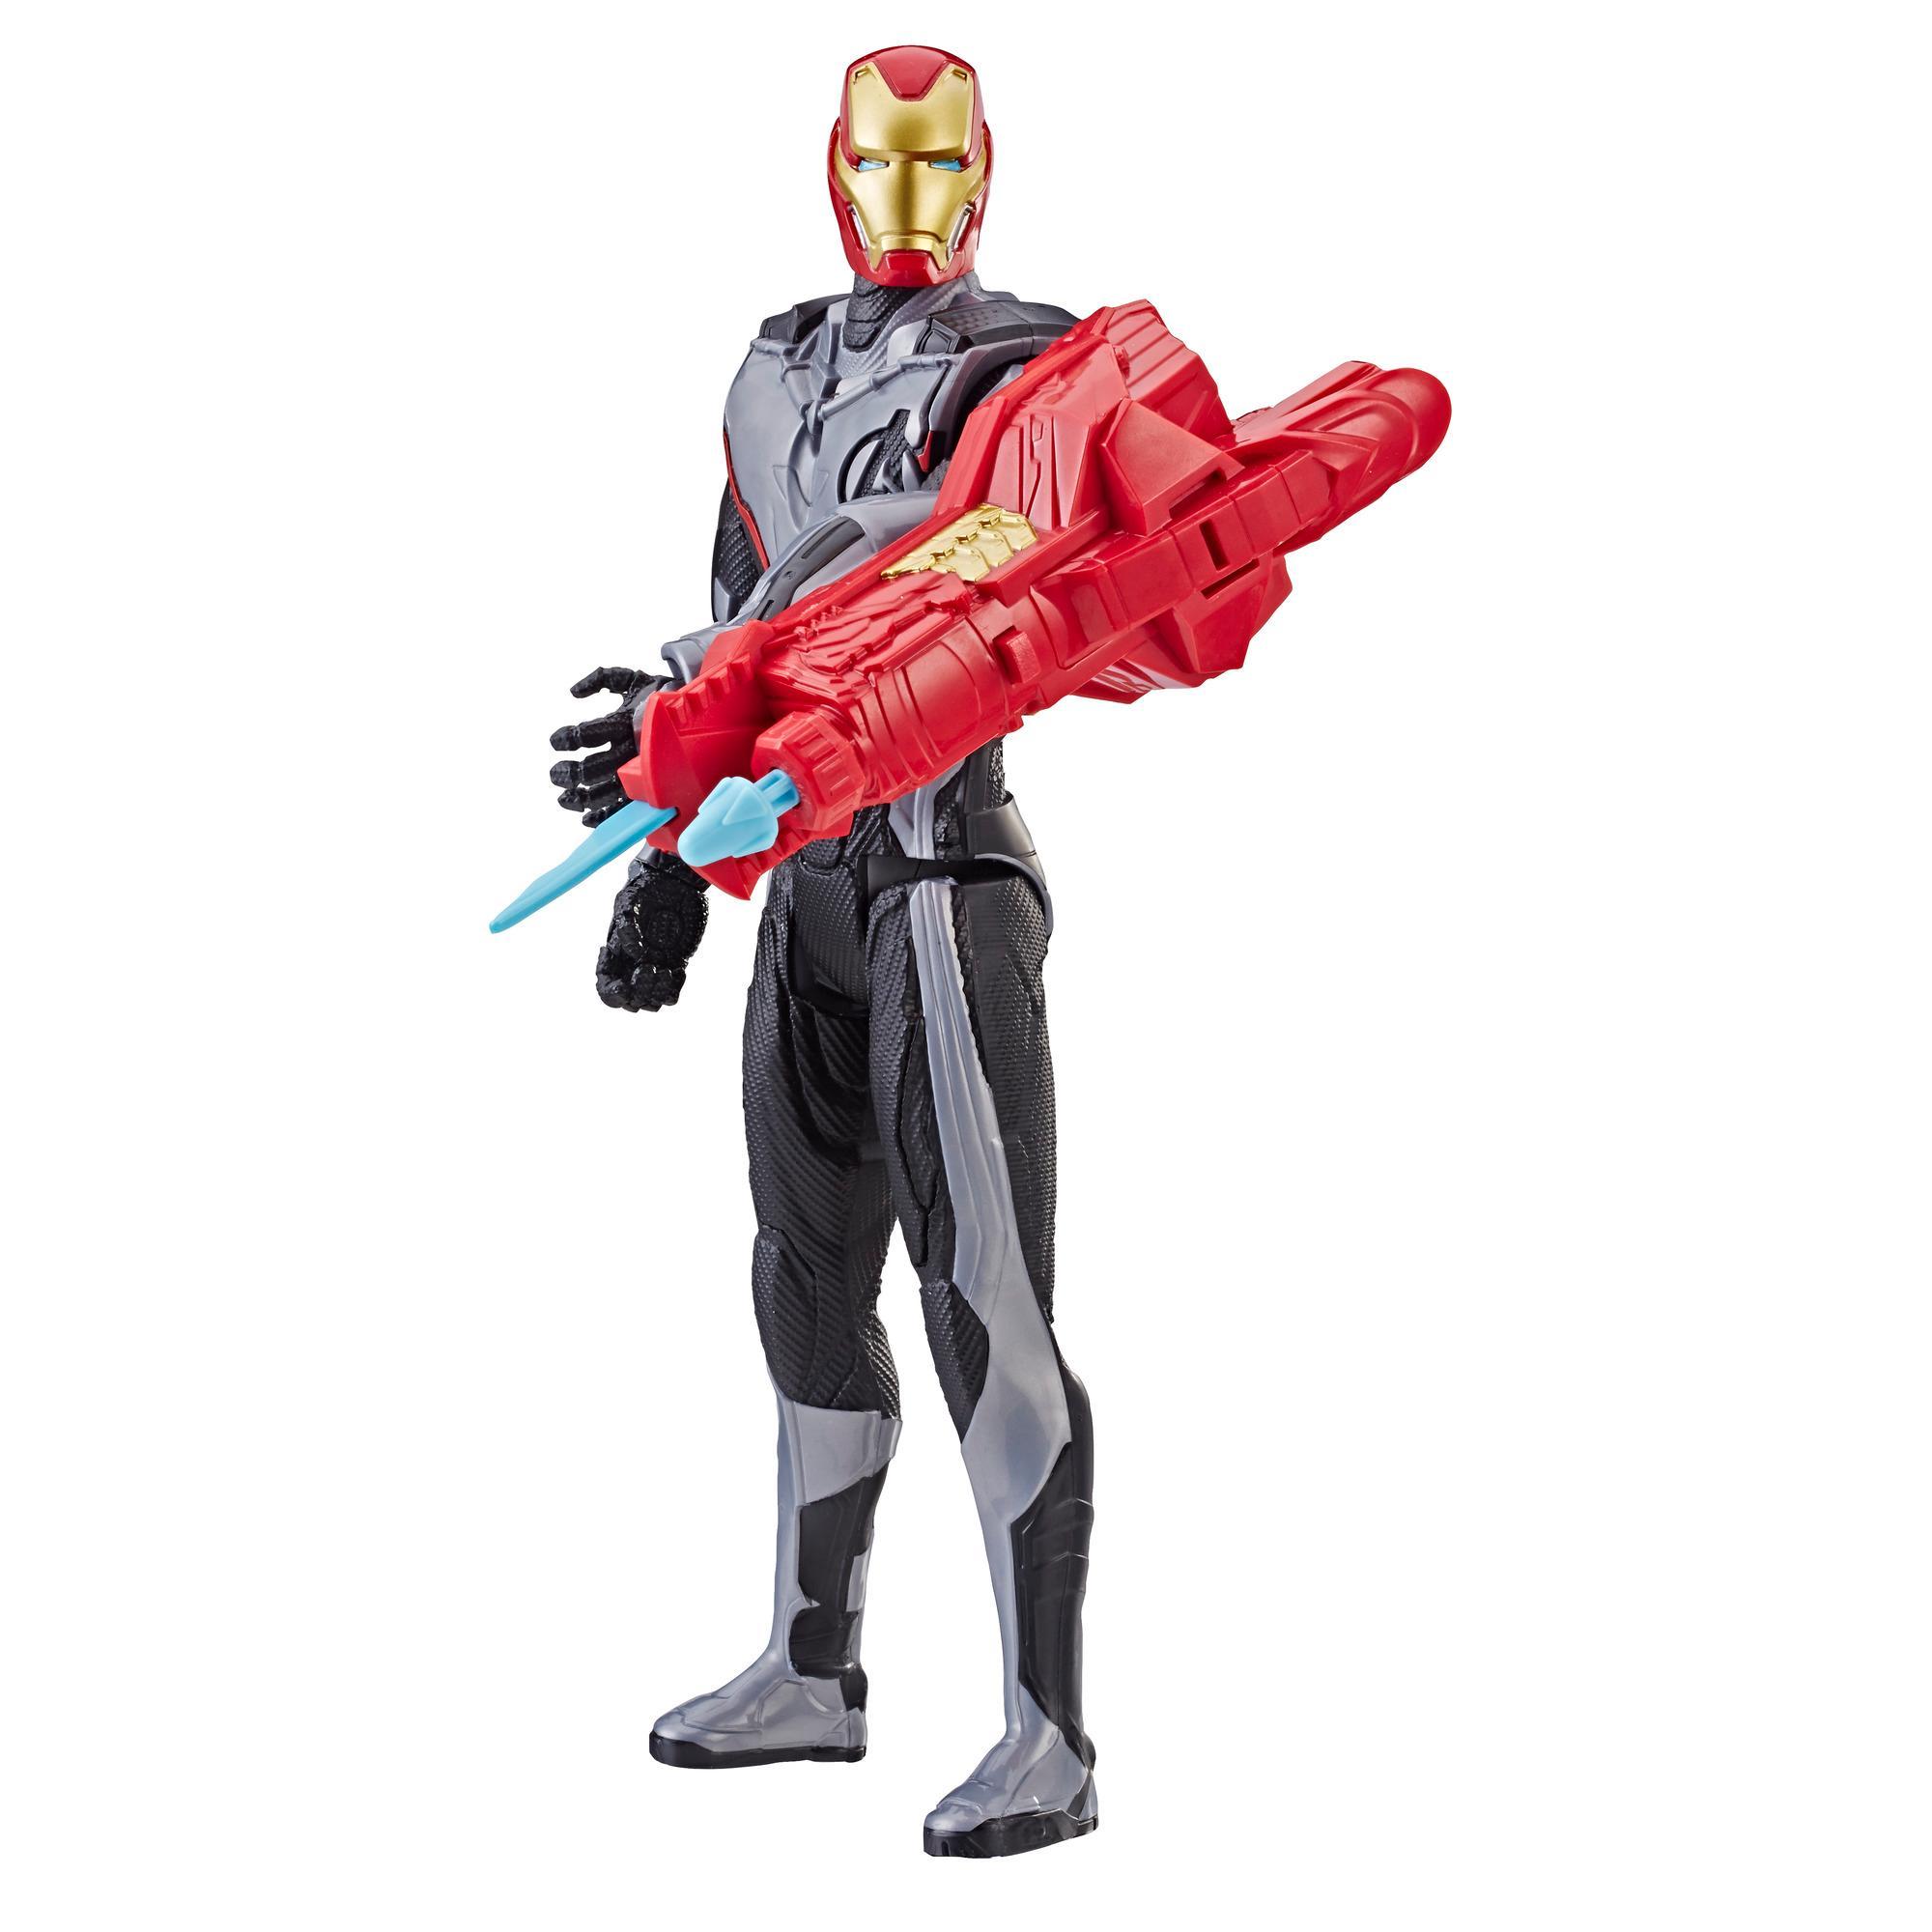 AVENGERS INFINITY WAR 2 - TITAN POWERFX IRON MAN